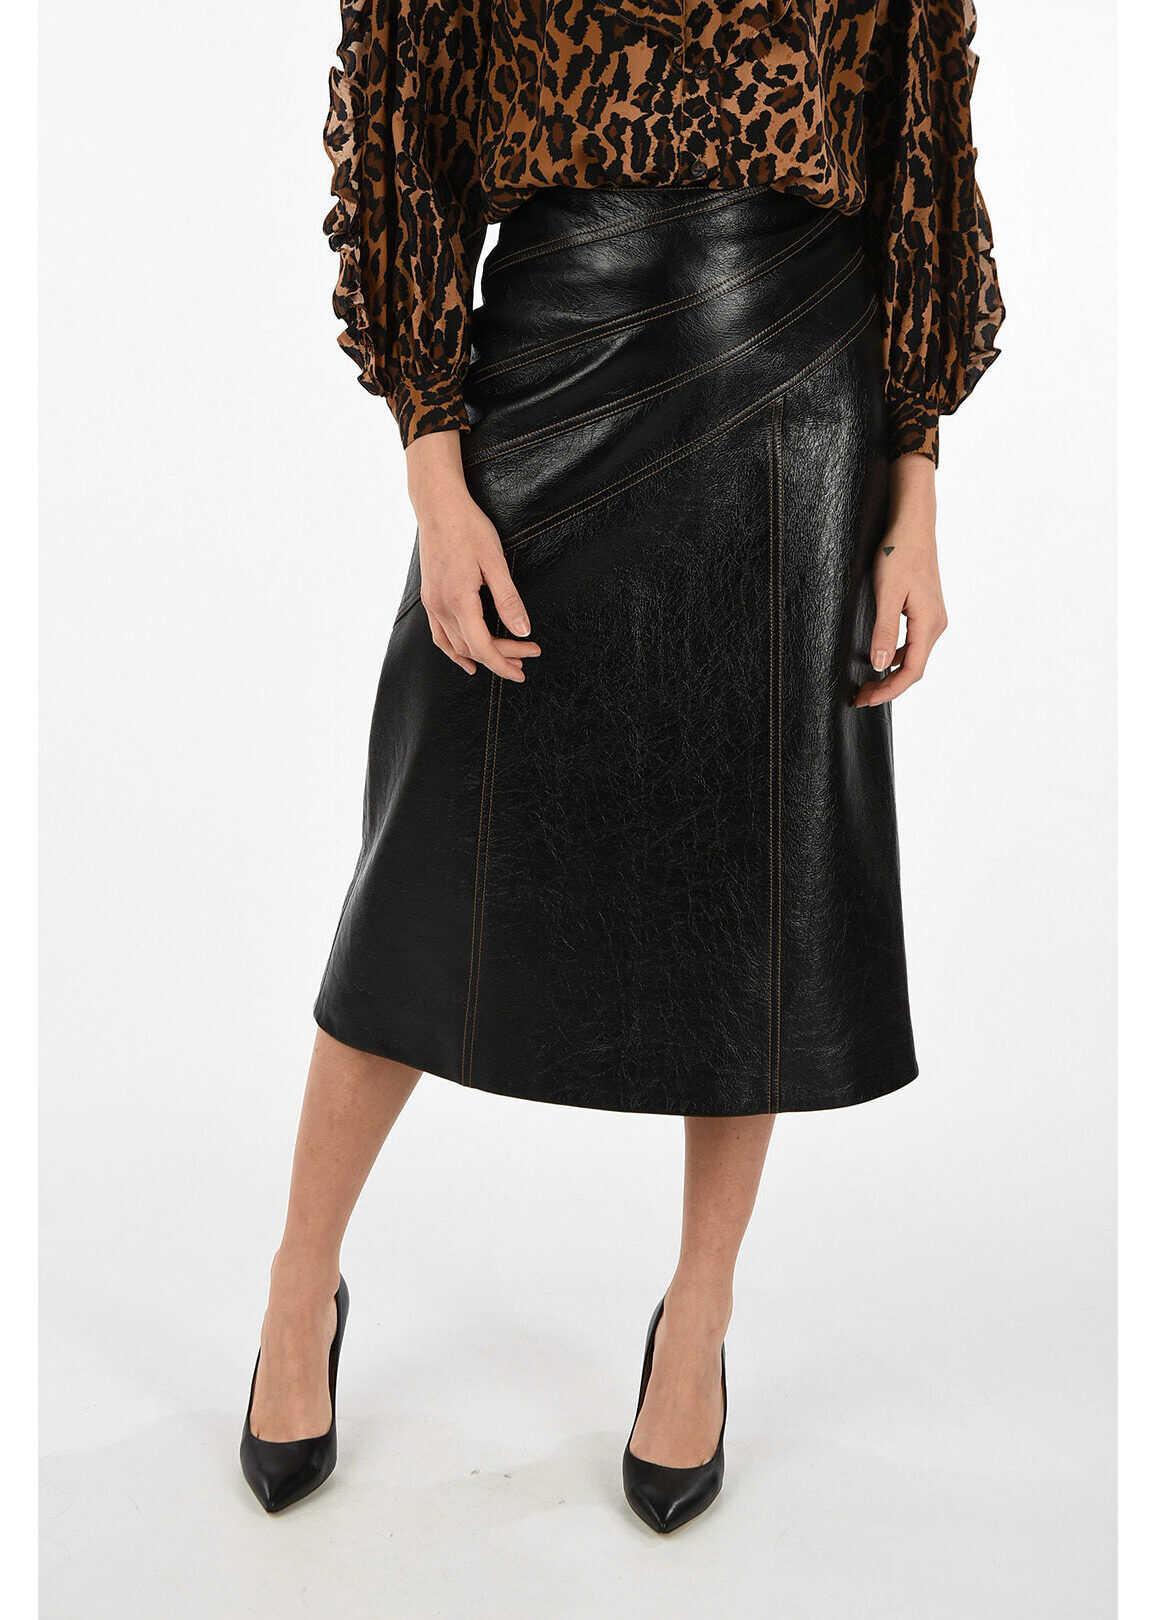 Miu Miu leather skirt BLACK